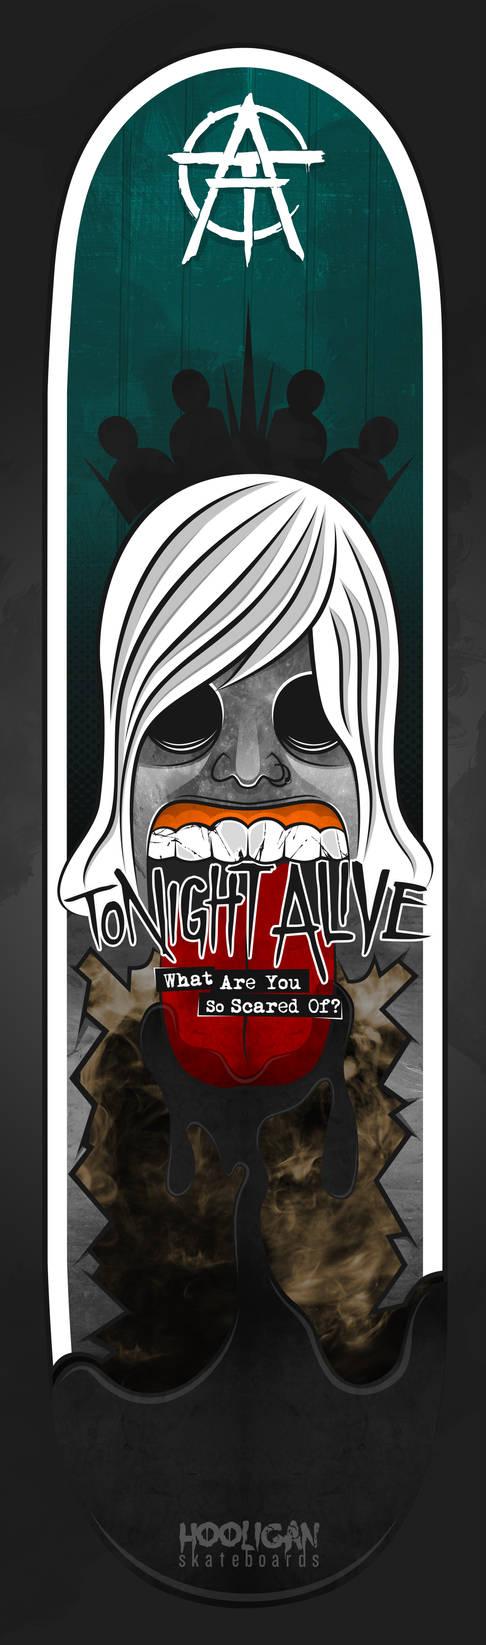 Tonight Alive Sk8Board